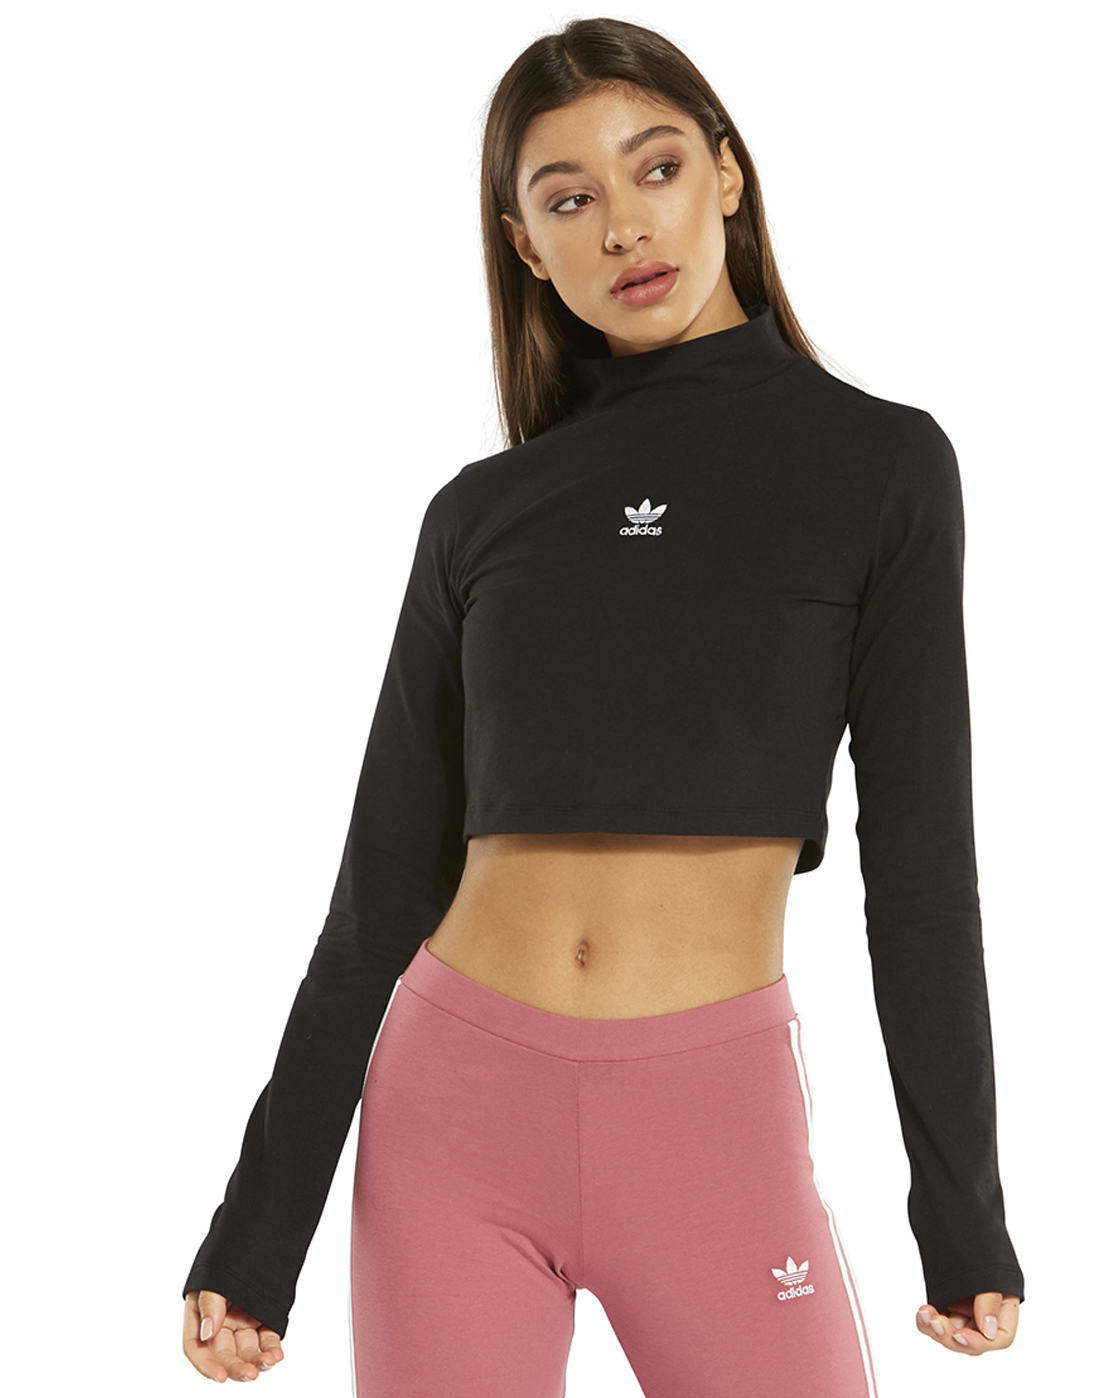 b249fc3088 adidas Originals Womens Crop Long Sleeve Top   Life Style Sports